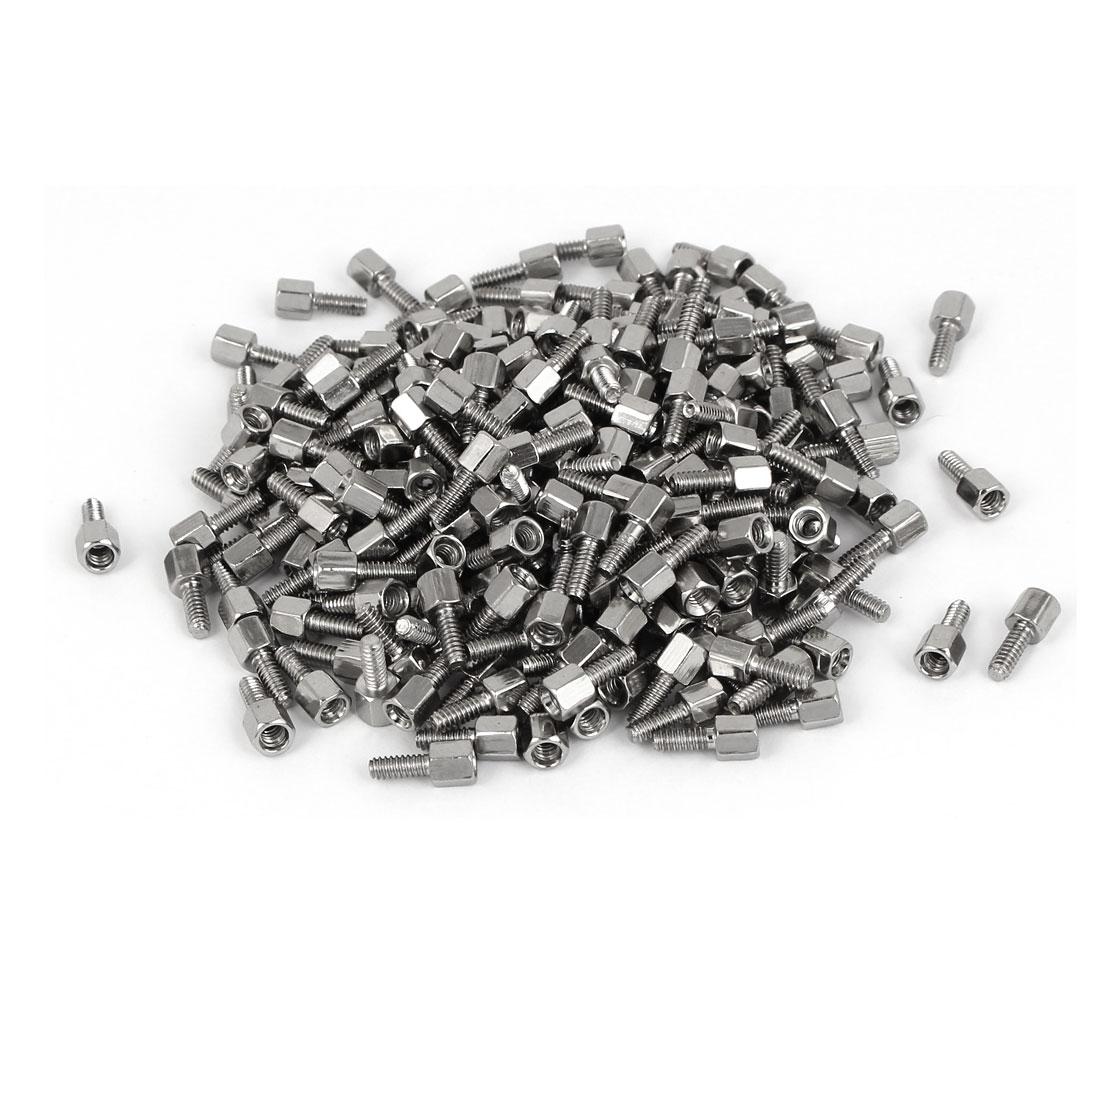 M3x5mm+7mm Male to Female Thread Brass Spacer Hexagonal Standoff Pillar 500pcs